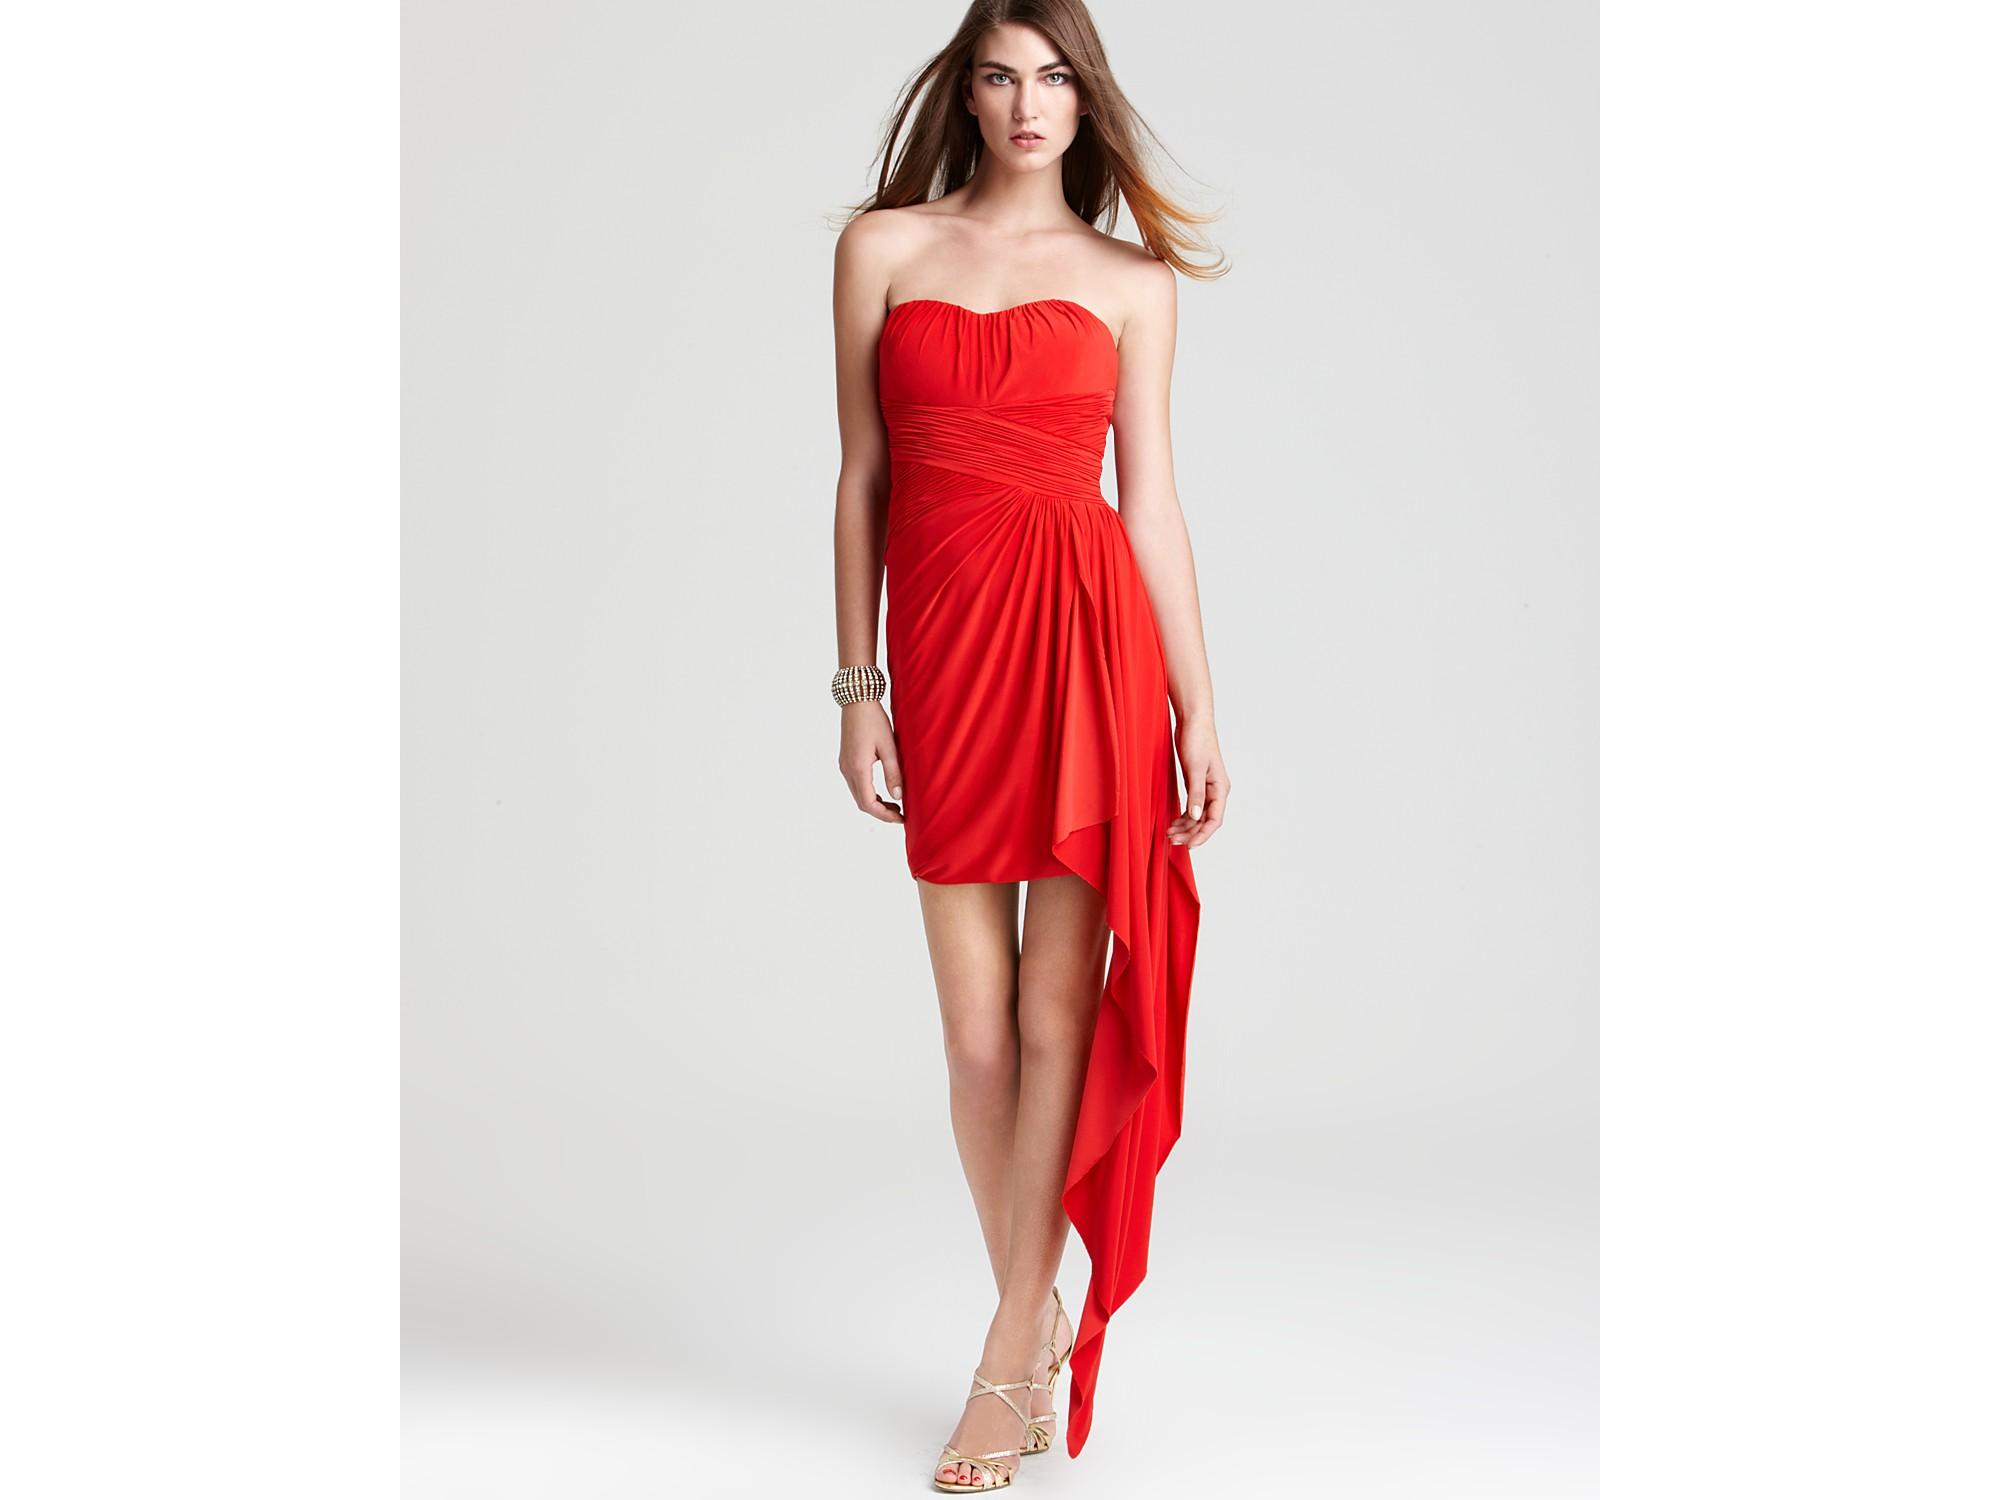 Max Amp Cleo Shawna Slinky Strapless Dress In Red Lollipop